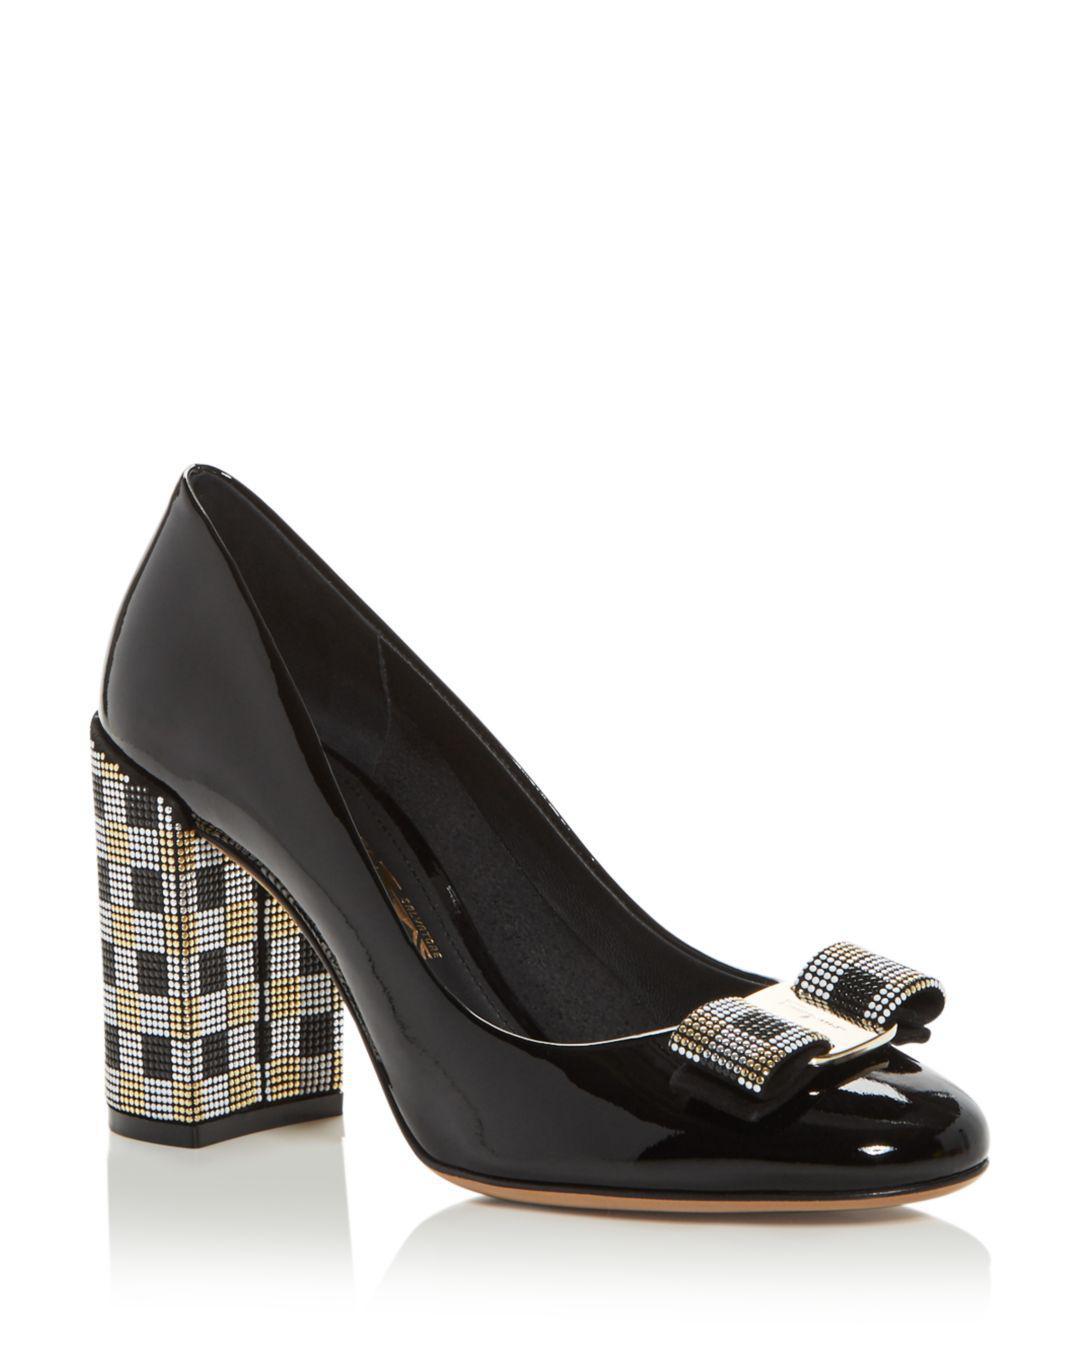 d7d4a55d6932 Lyst - Ferragamo Women s Vara Embellished High Block-heel Pumps in Black